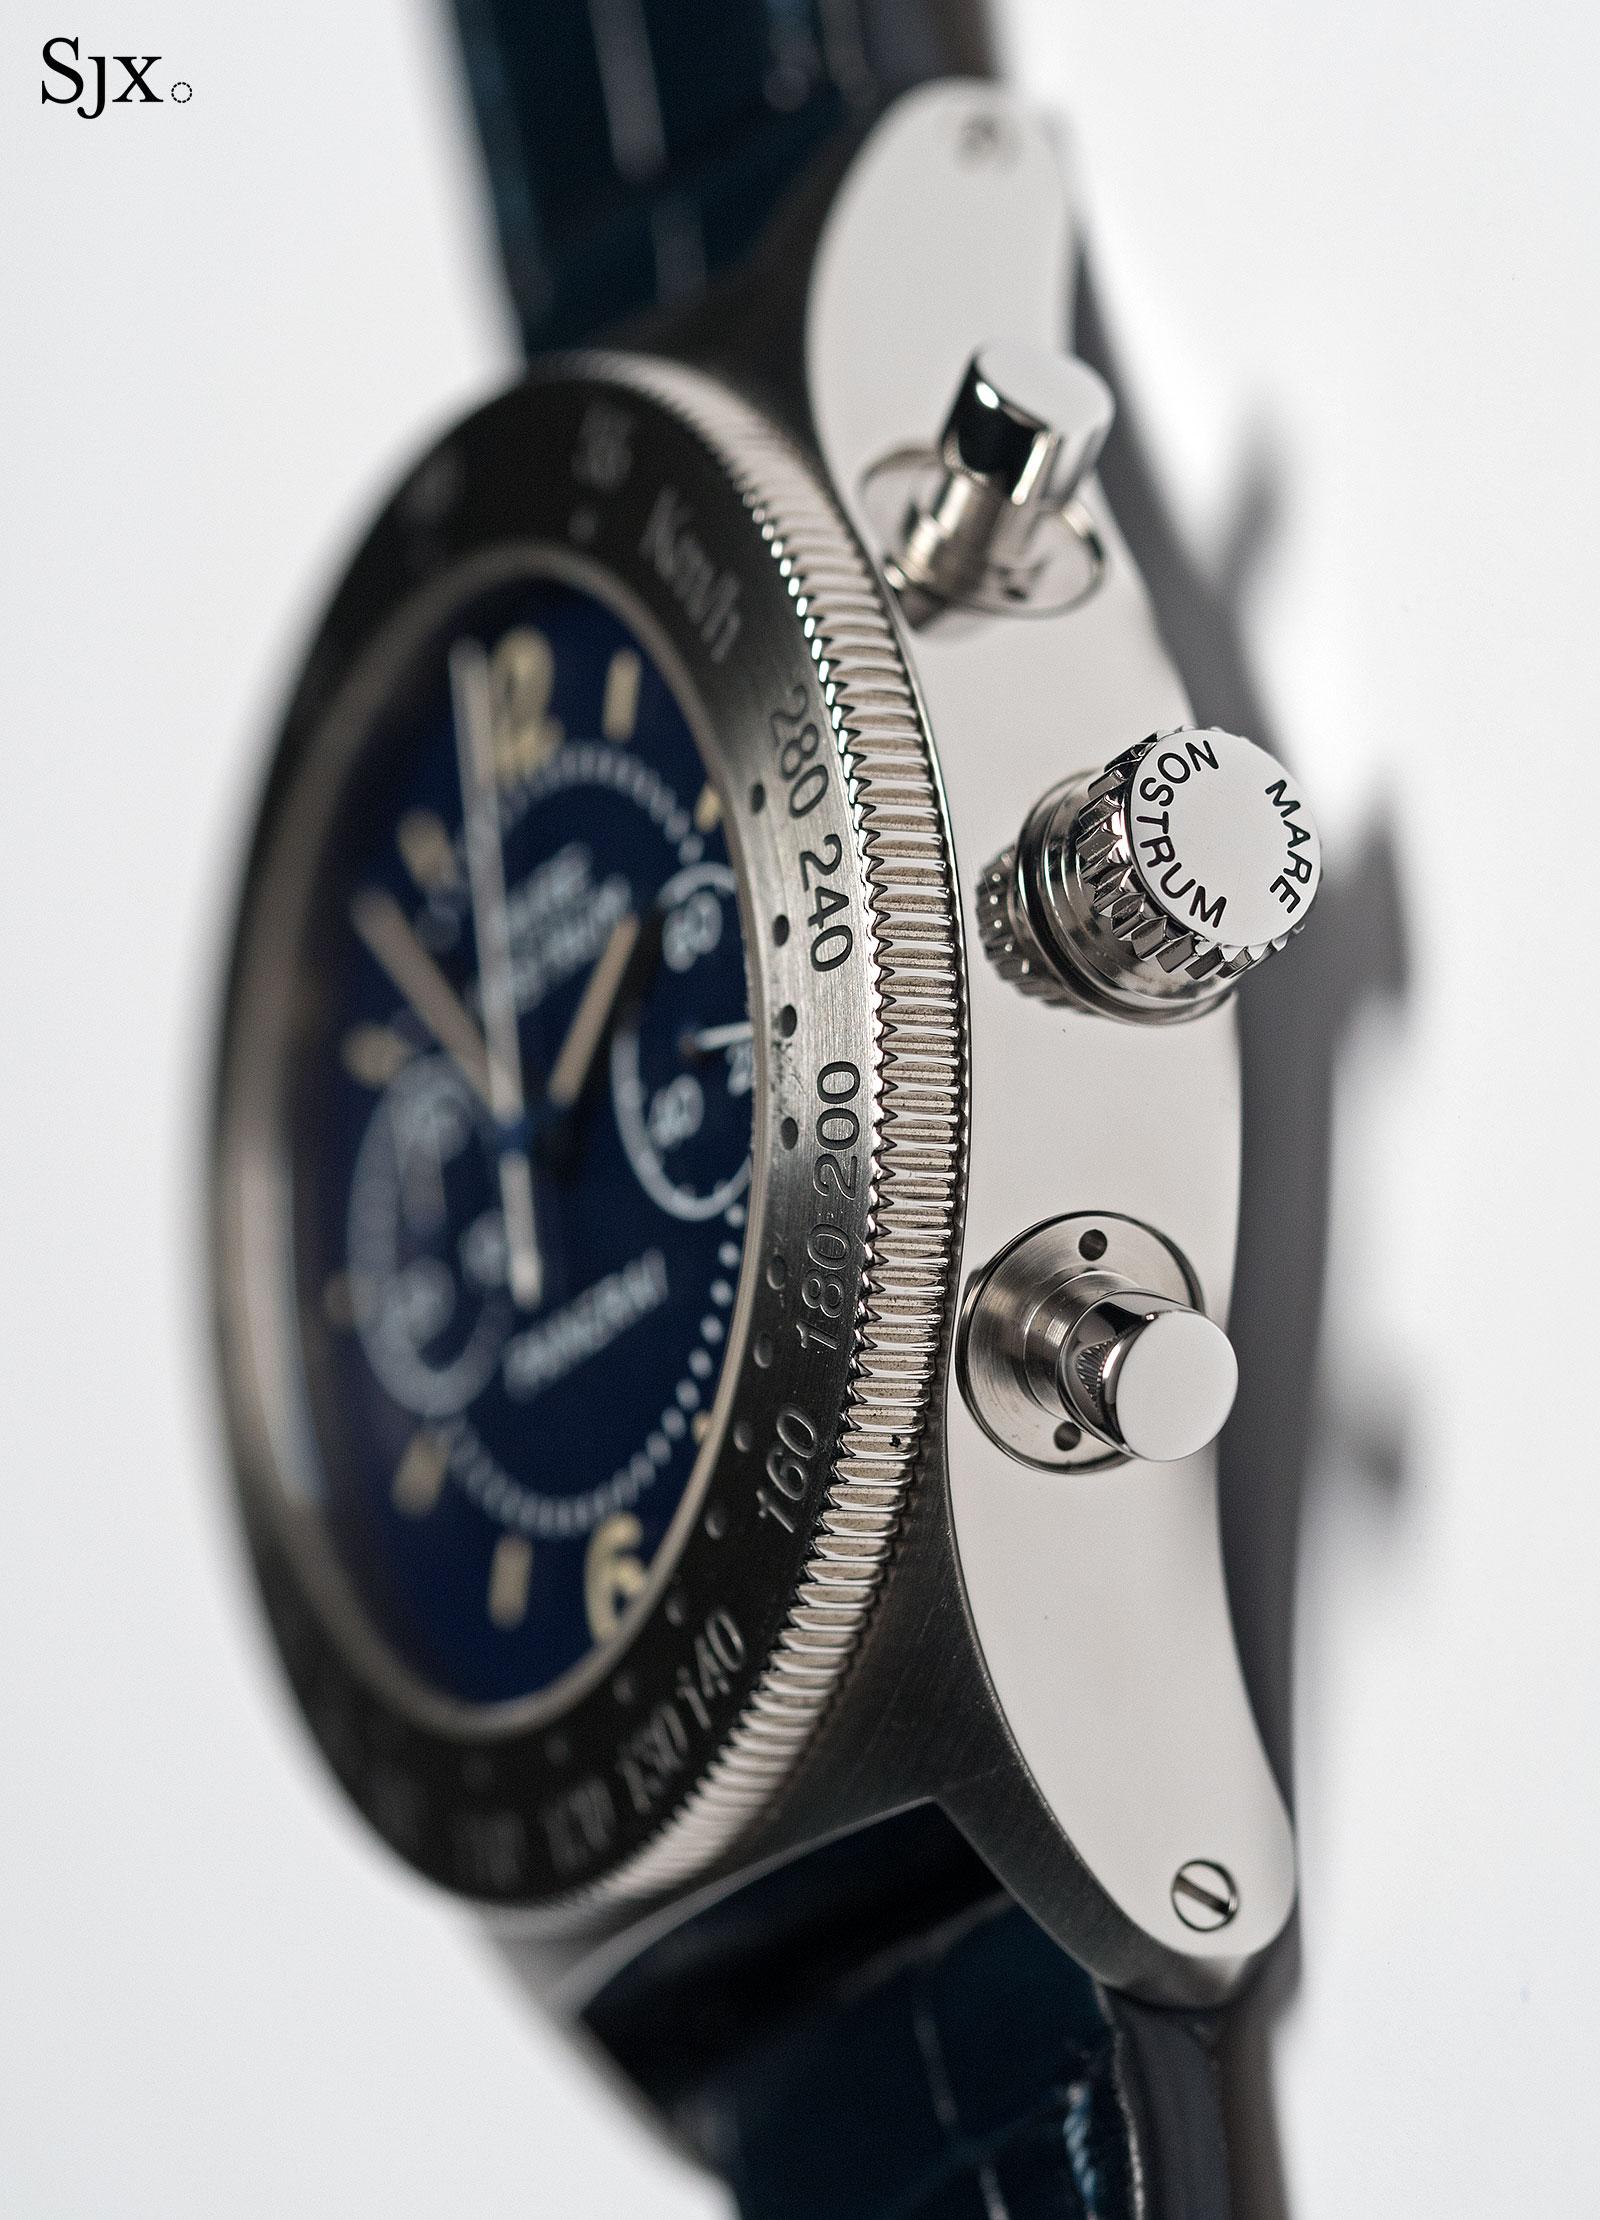 Panerai Mare Nostrum PAM 716 chrono 4